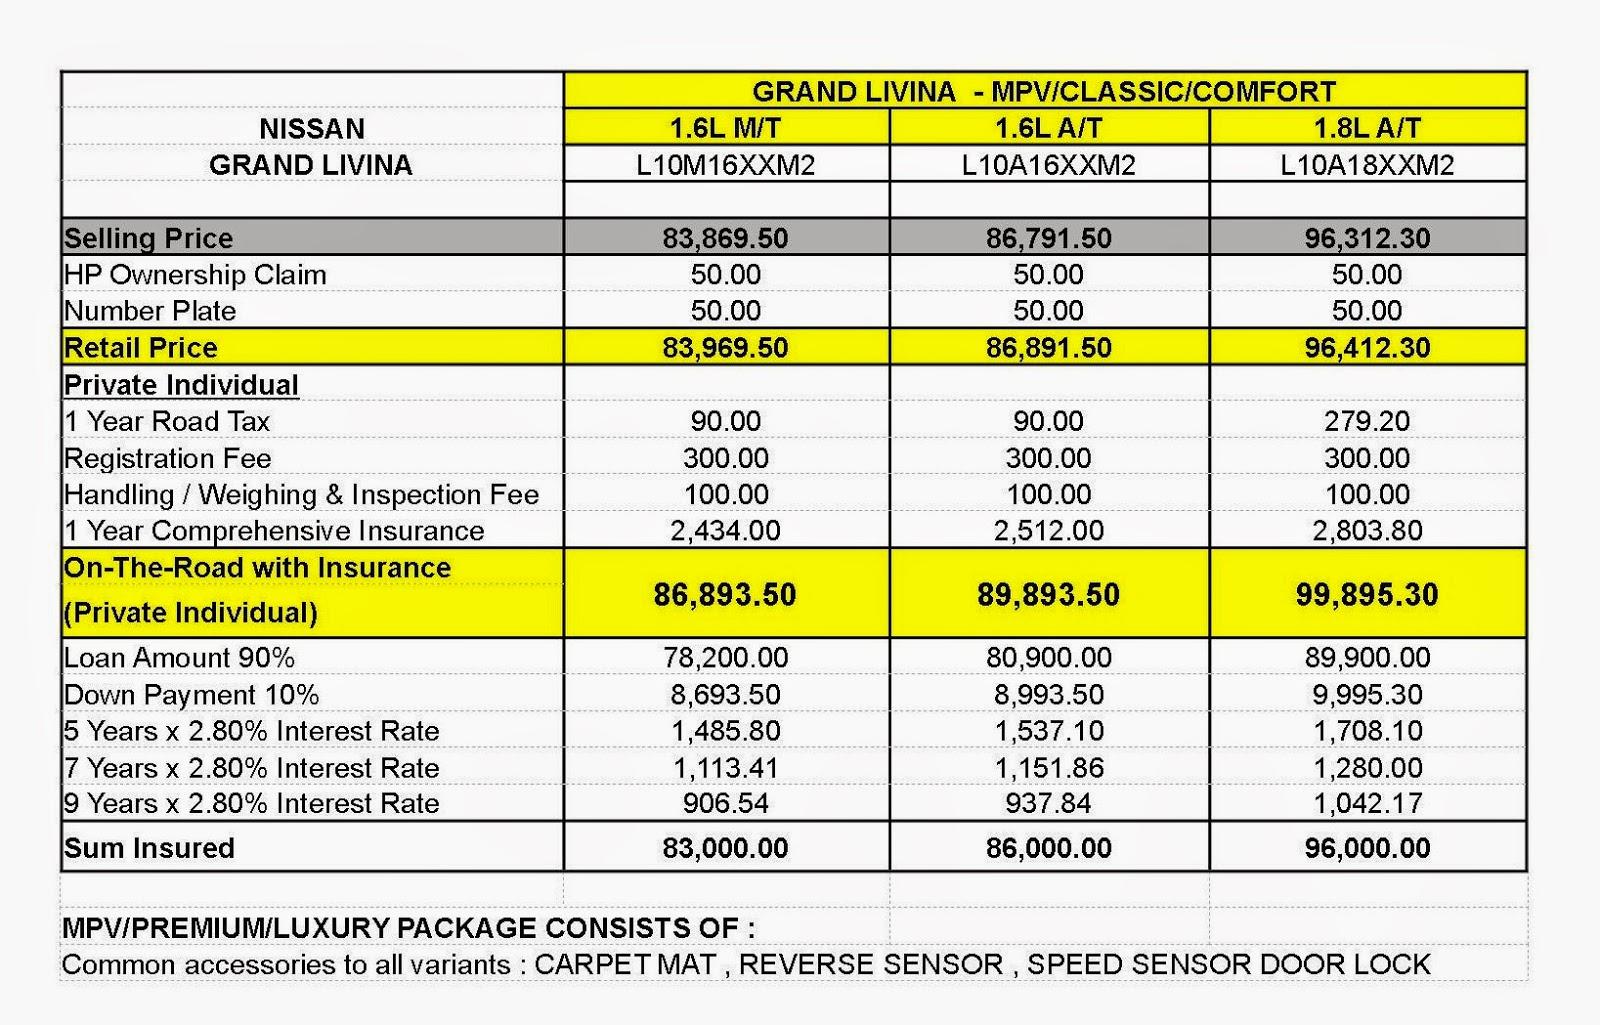 Auto loan interest rates 72 months 16